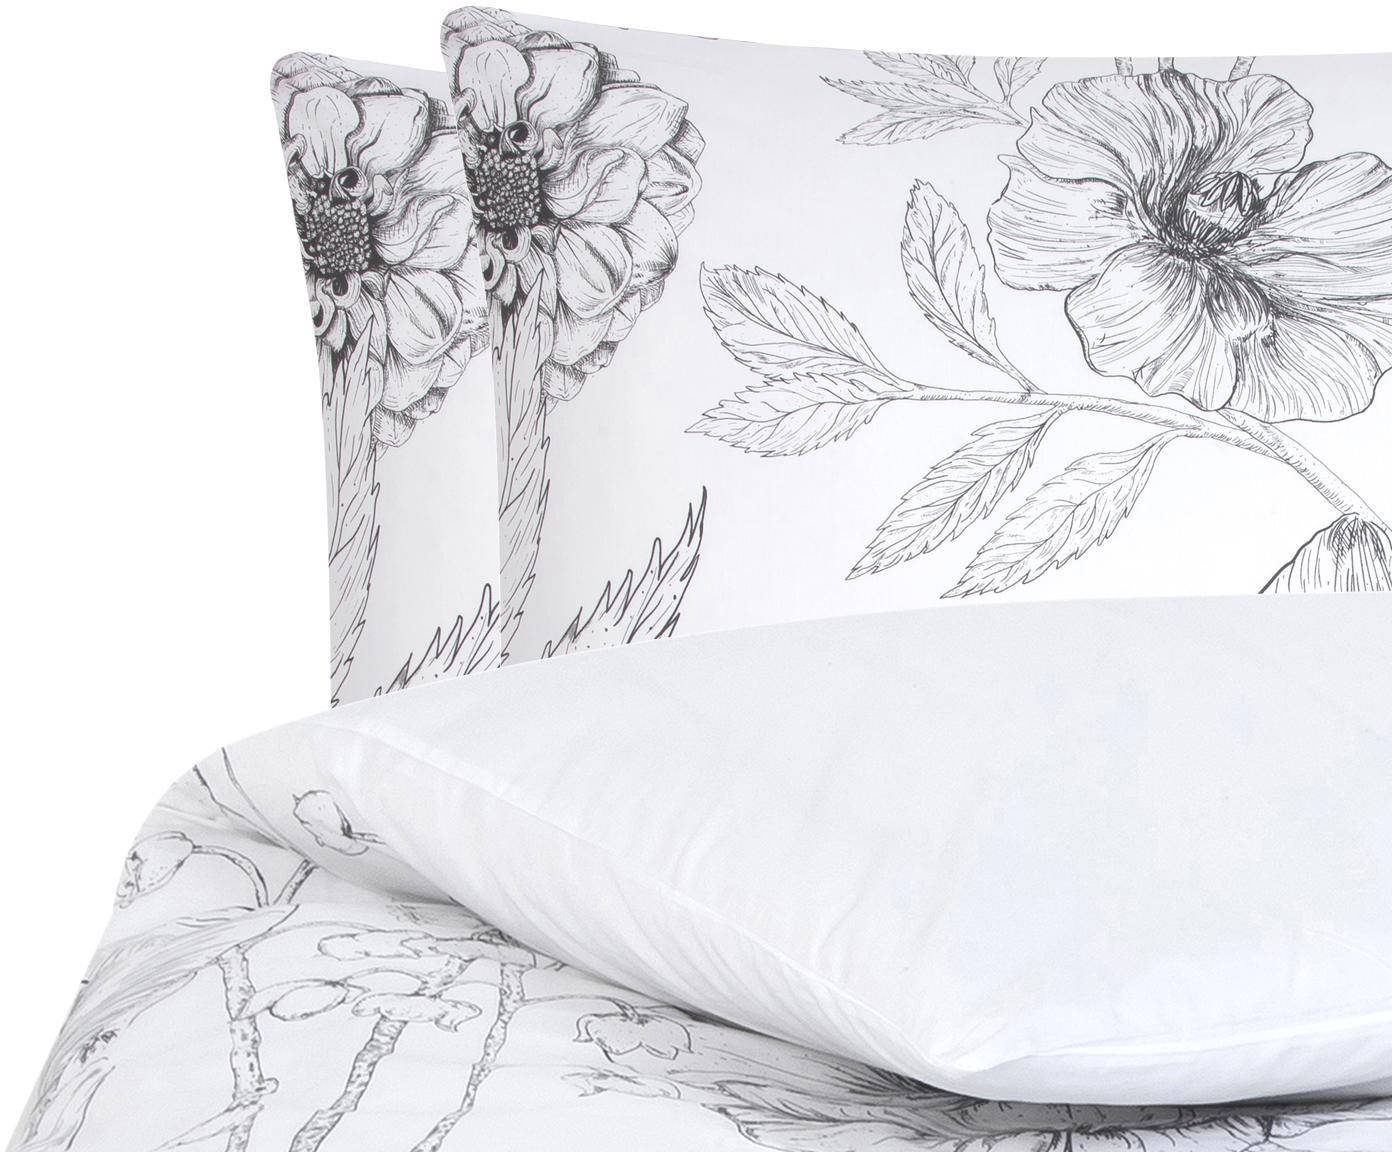 Baumwollperkal-Bettwäsche Keno mit Blumenprint, Webart: Perkal Fadendichte 180 TC, Weiß, Grau, 200 x 200 cm + 2 Kissen 80 x 80 cm